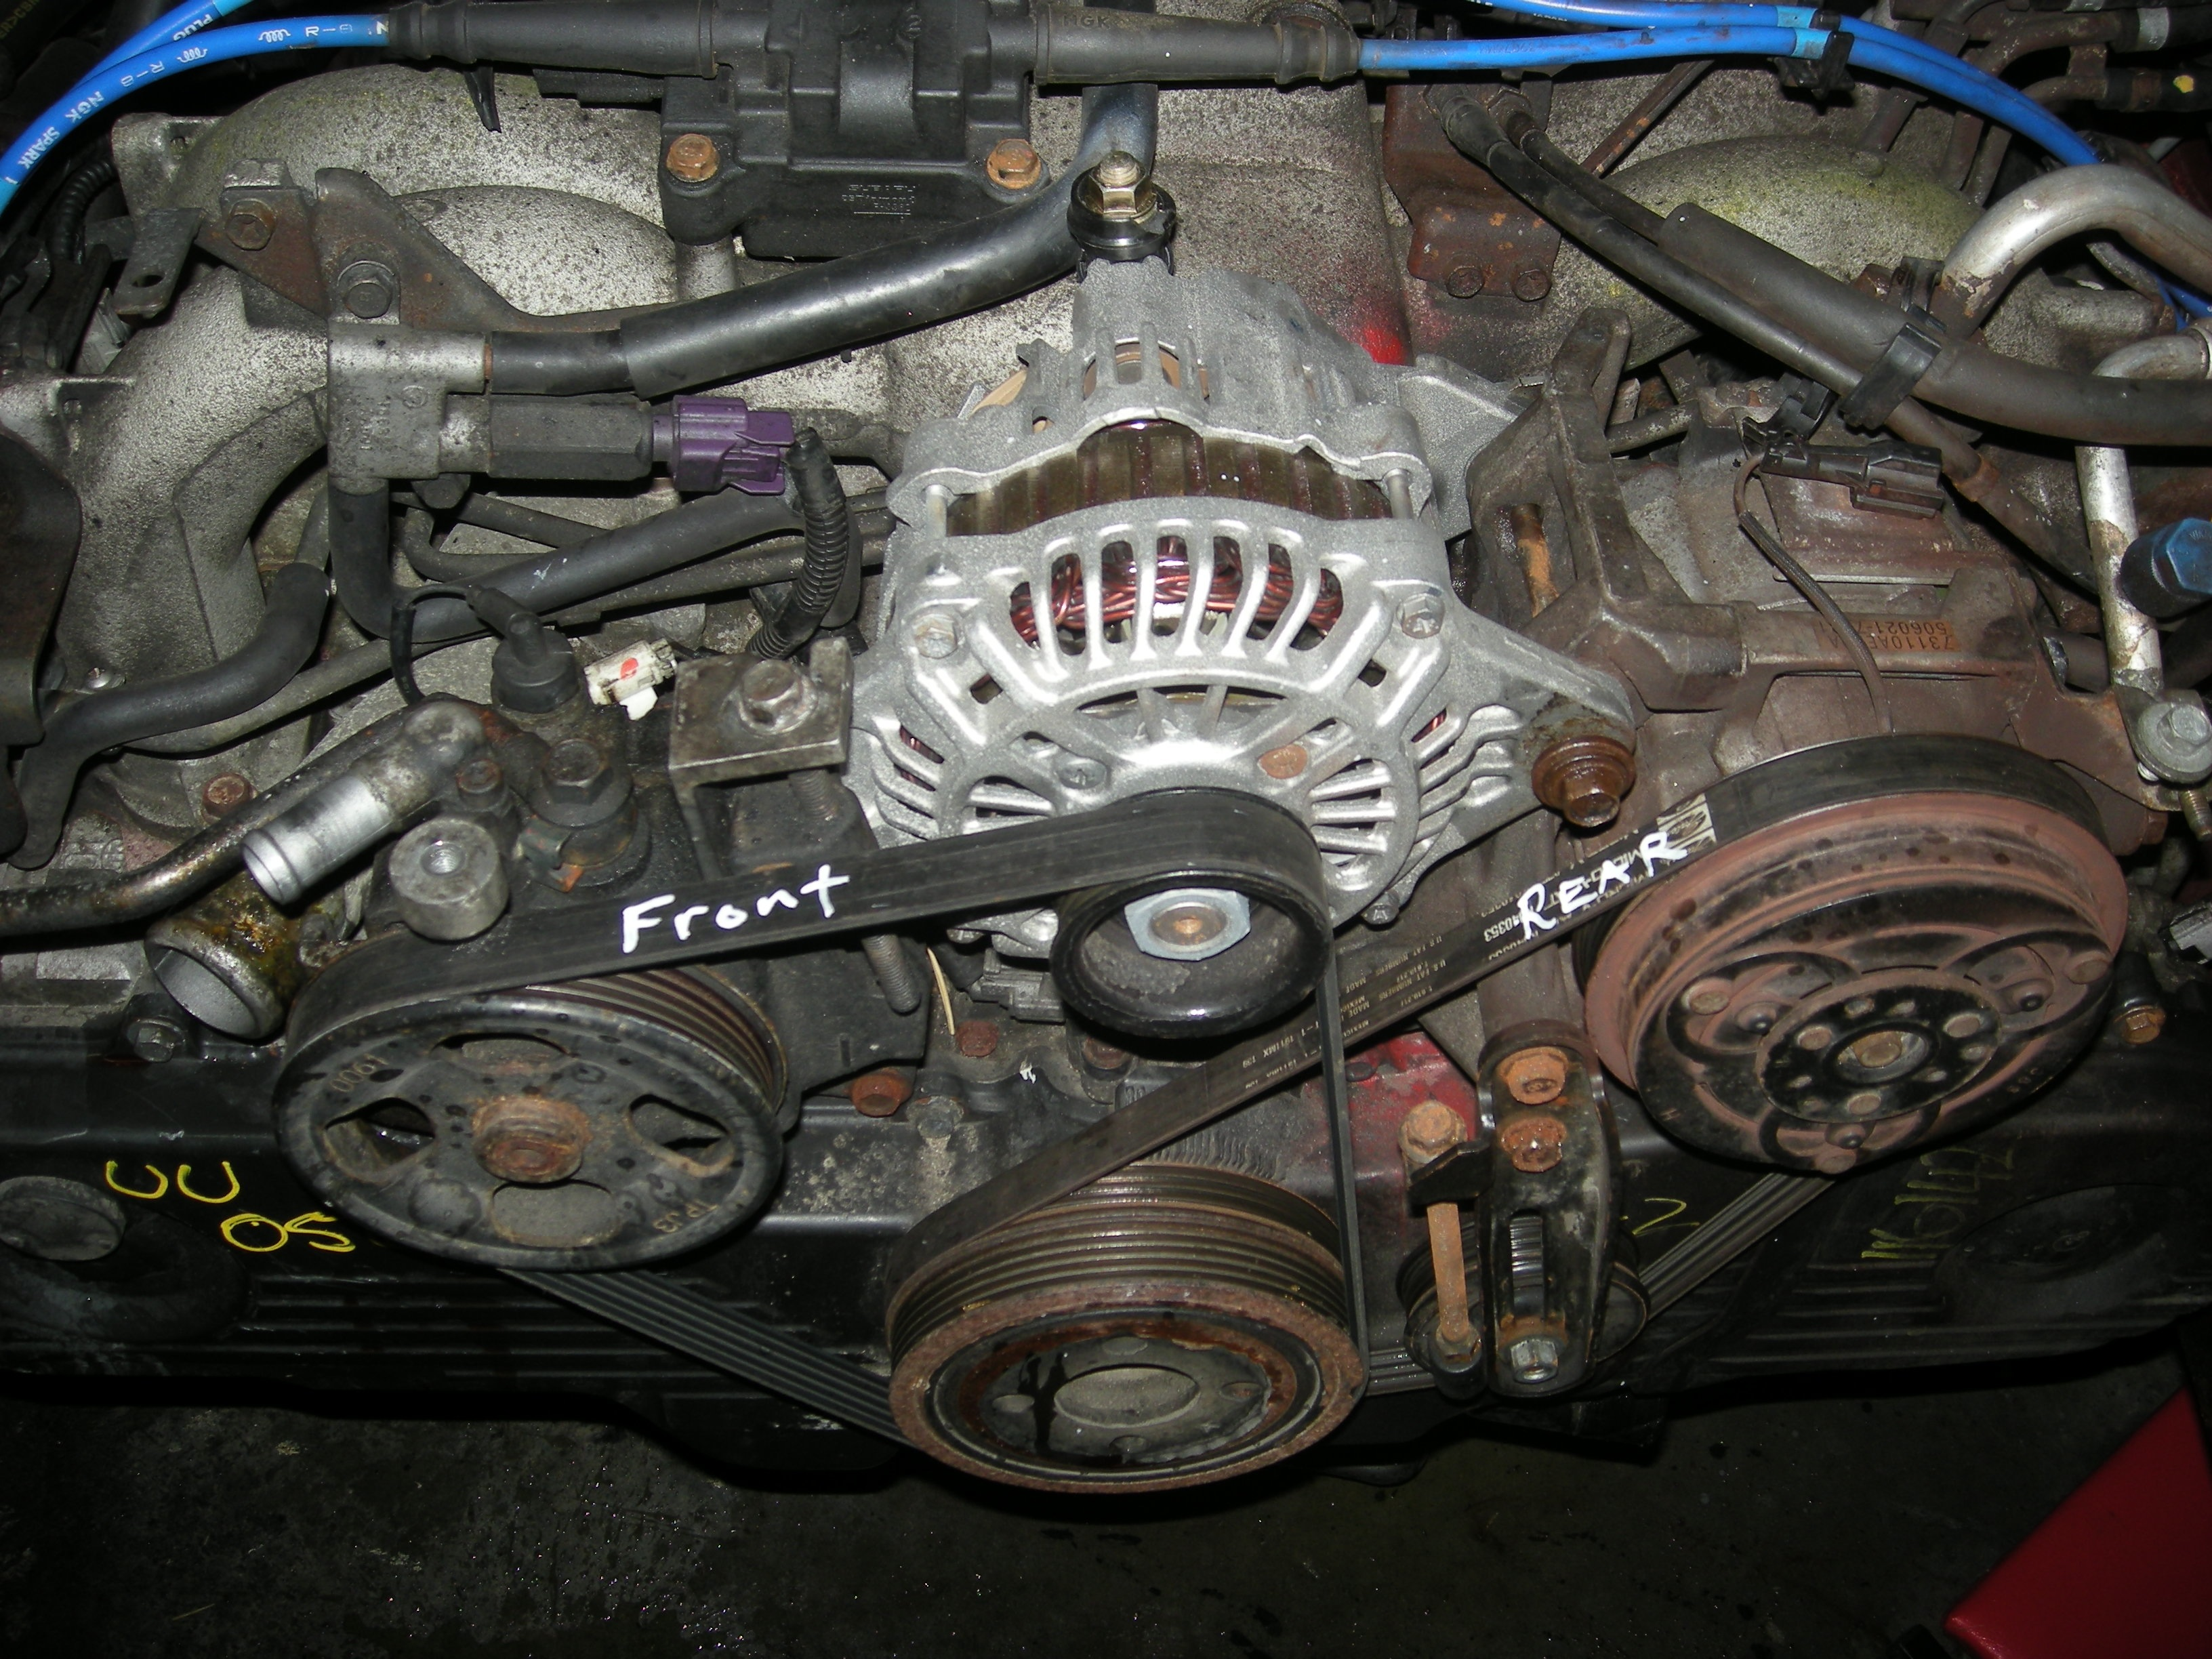 medium resolution of subaru boxer engine belt diagram wiring diagram source subaru 2 0 boxer engine diagram subaru boxer 4 engine fwd trans diagram